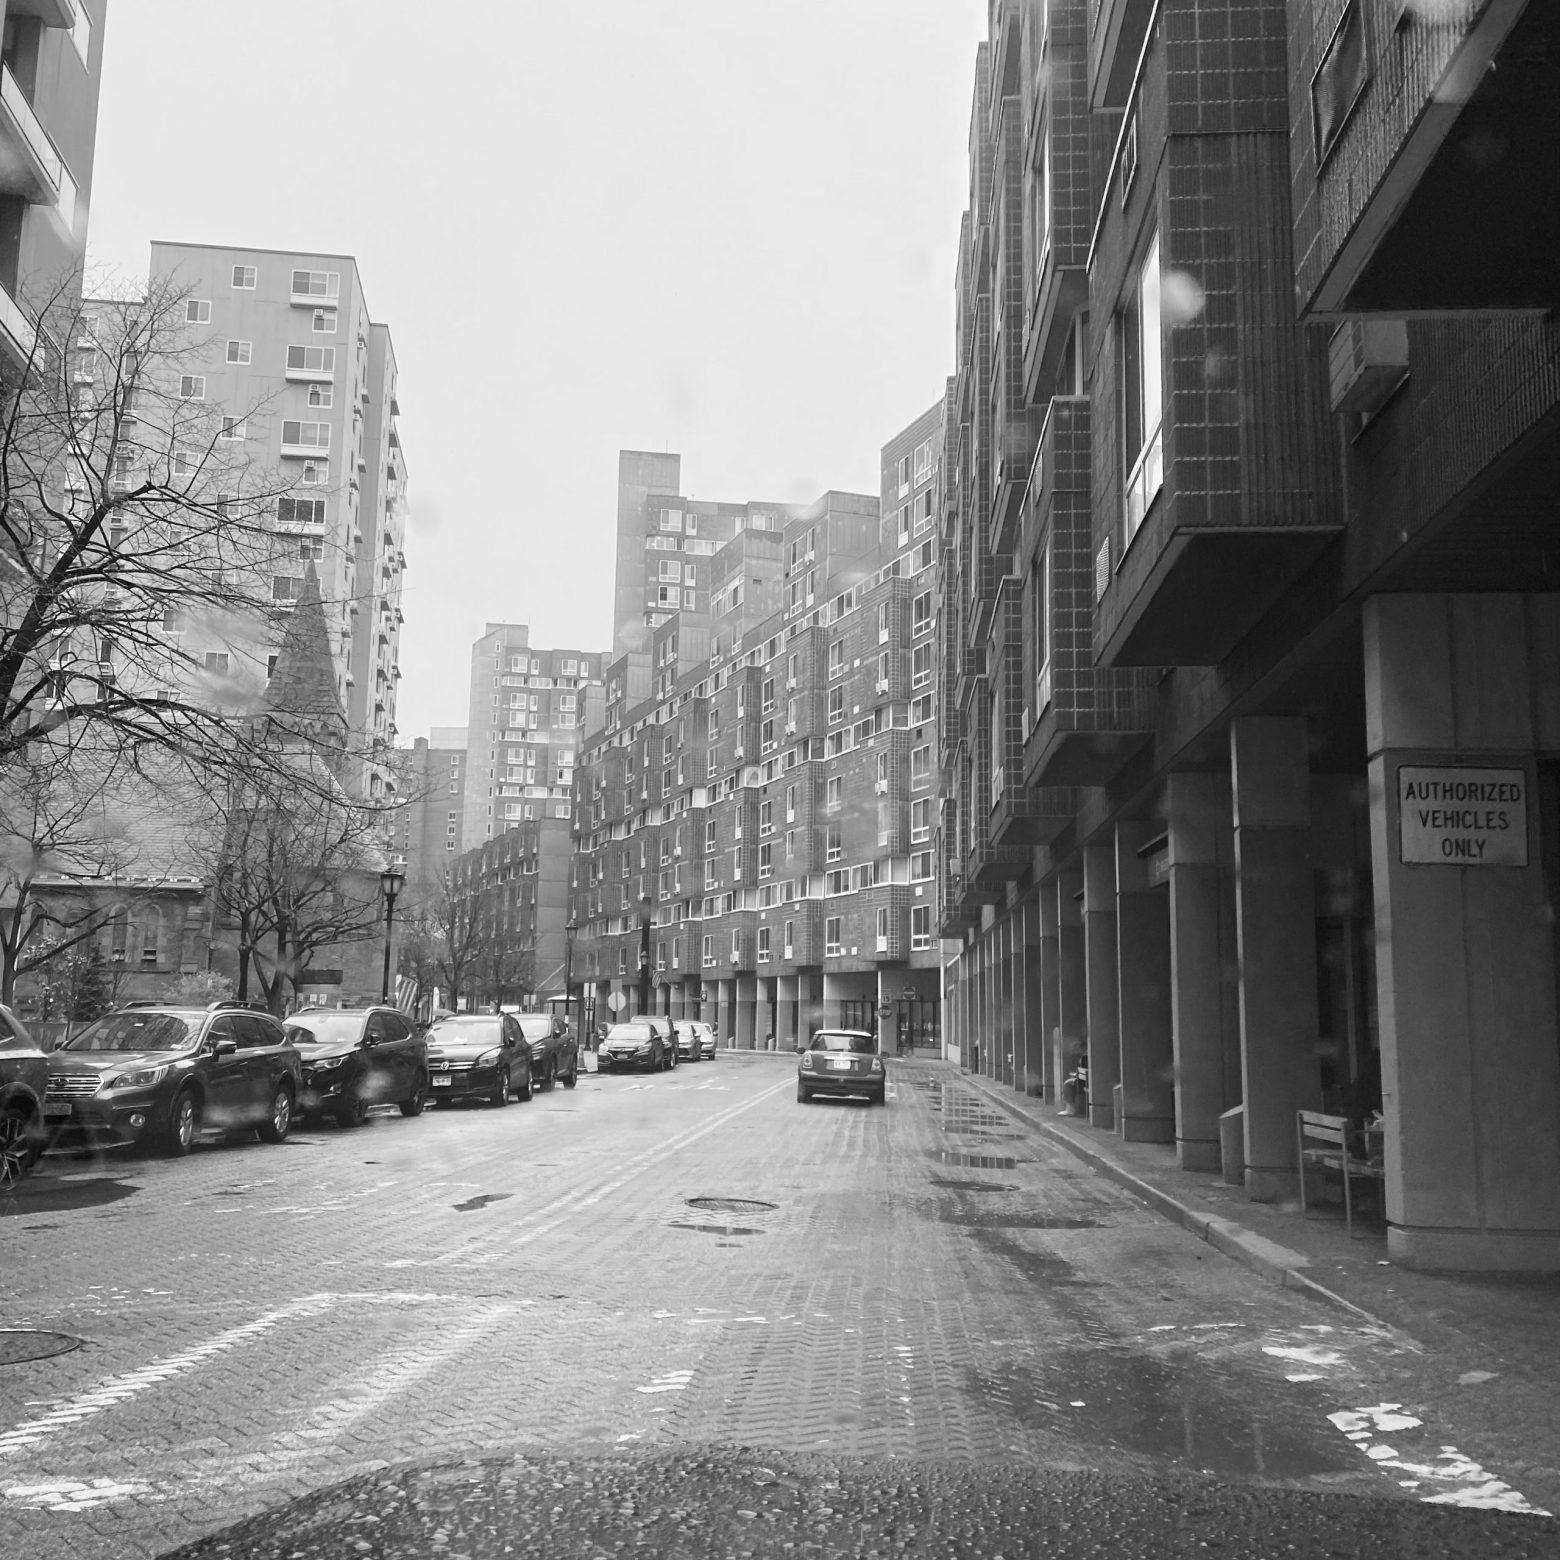 Roosevelt Island Main Street